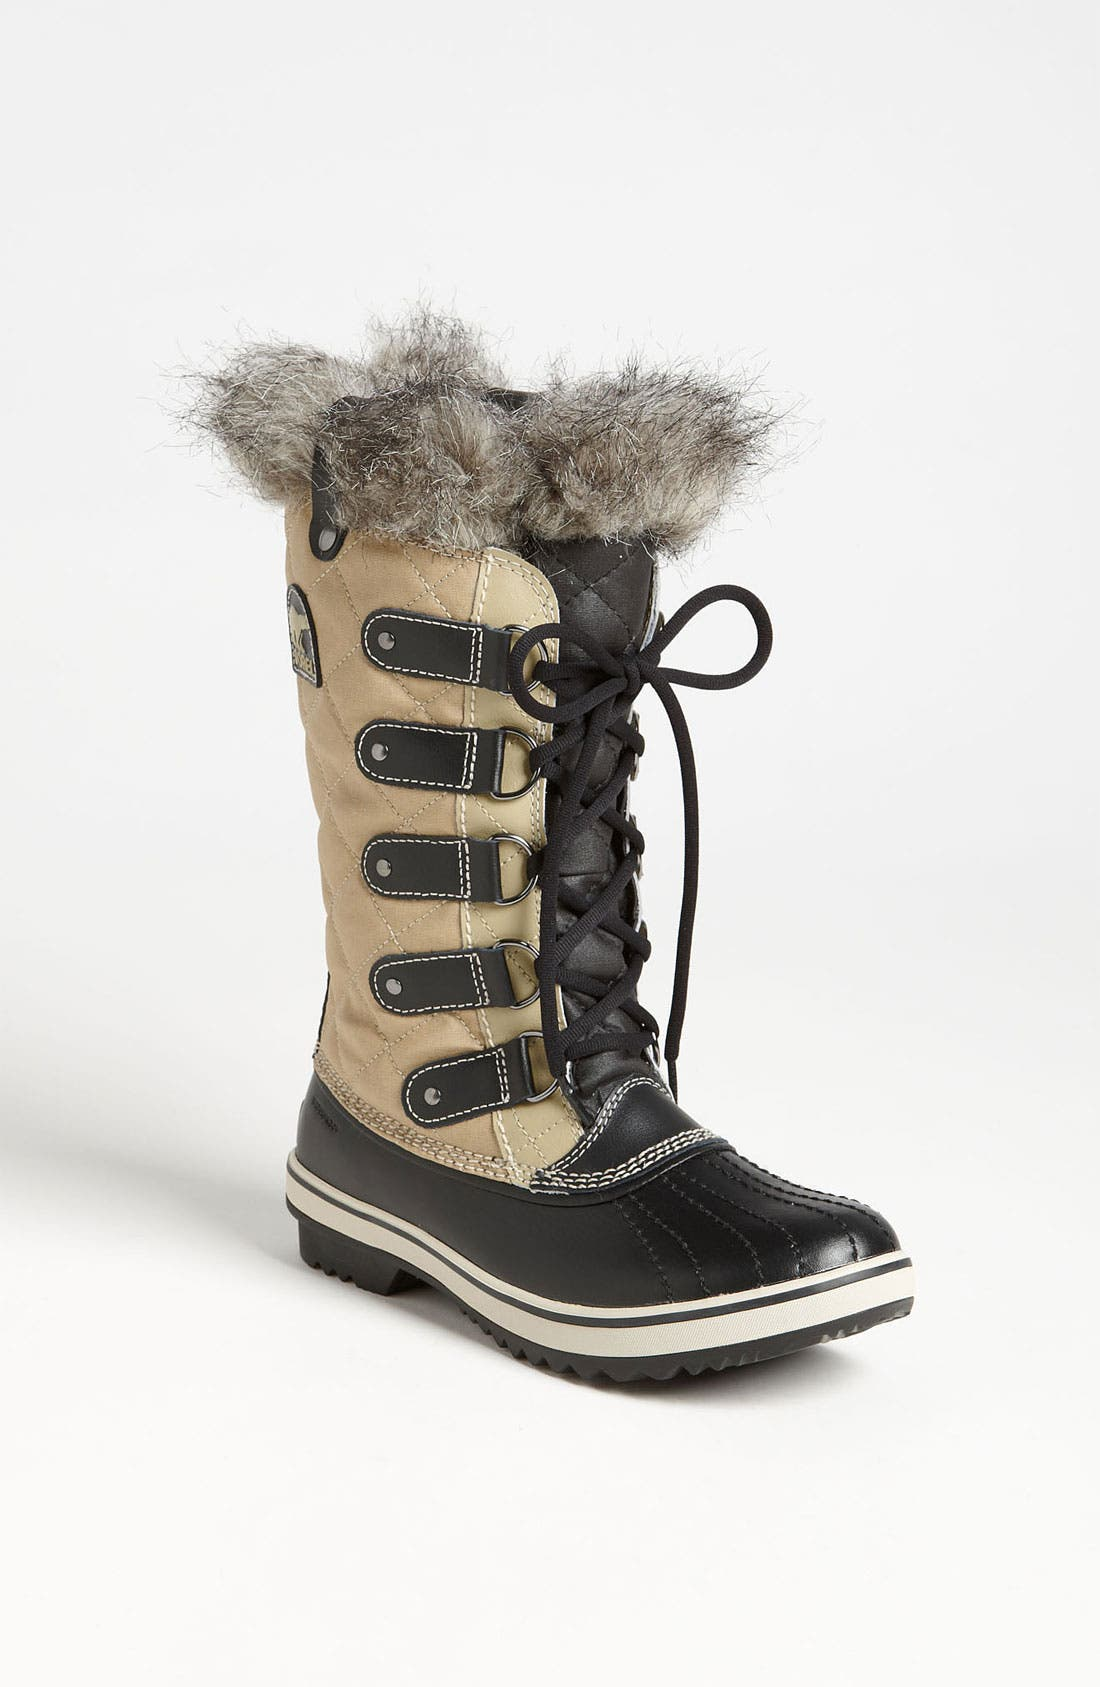 Alternate Image 1 Selected - SOREL 'Tofino' Boot